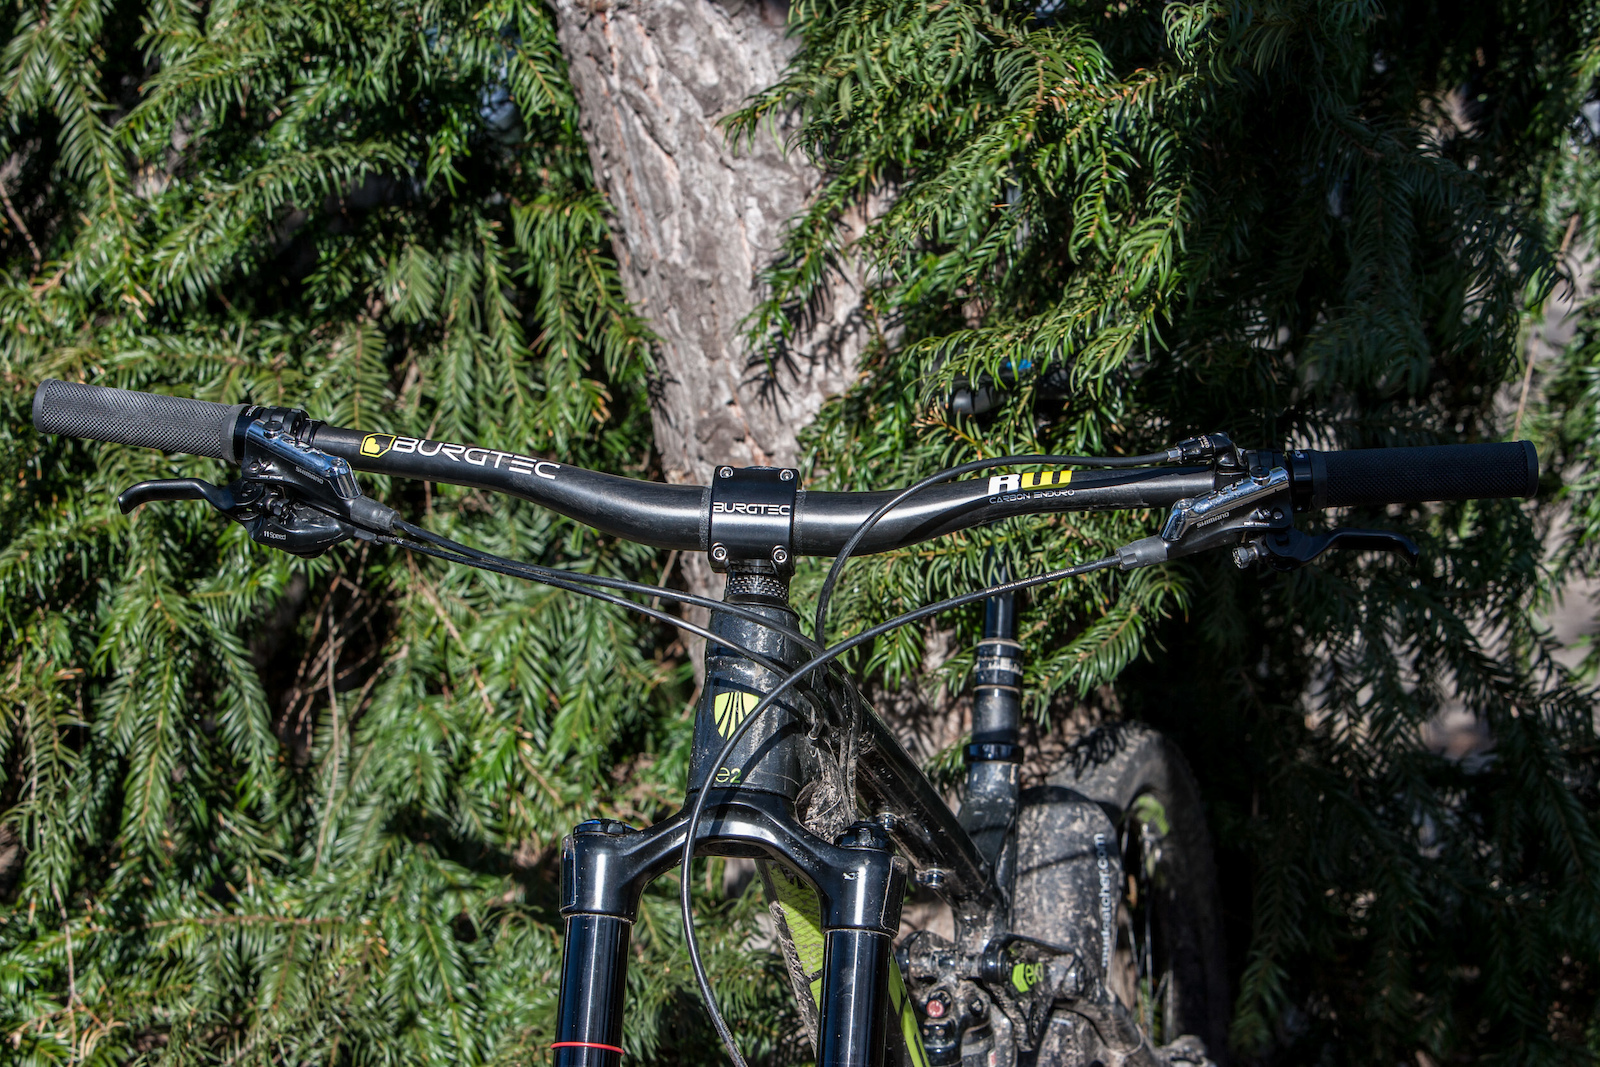 Burgtec Ride Wide Carbon Enduro Bar